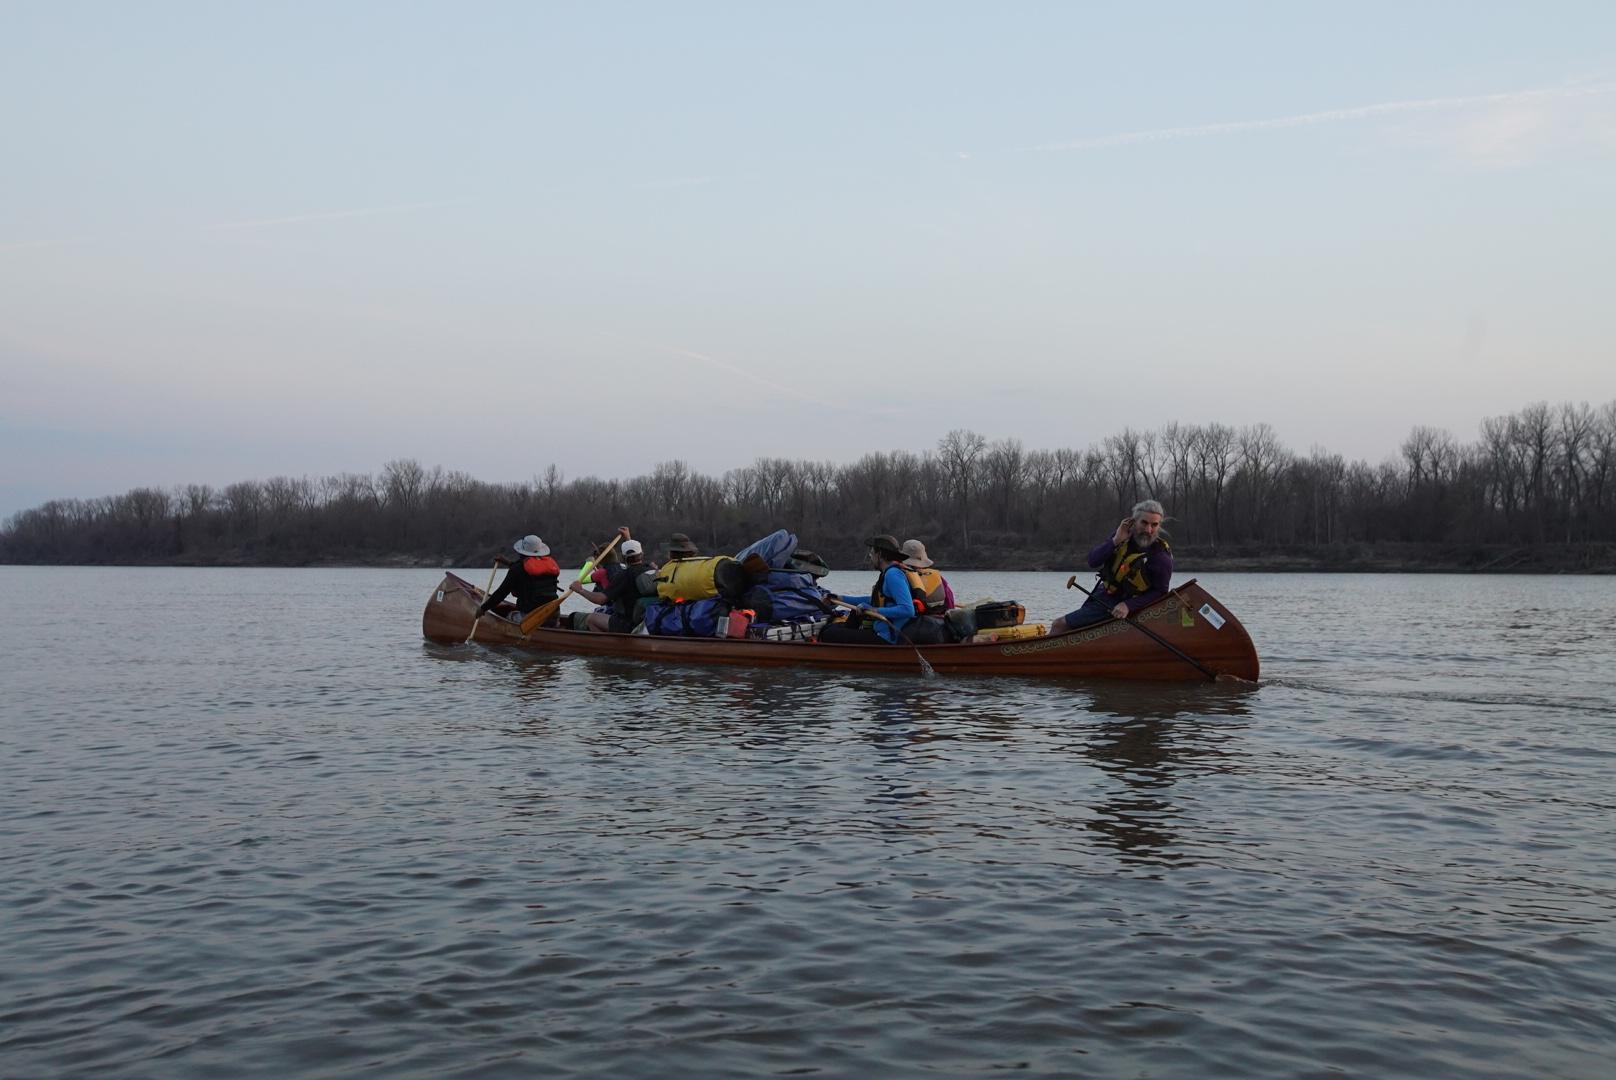 Paddling the Missouri River in tandem.